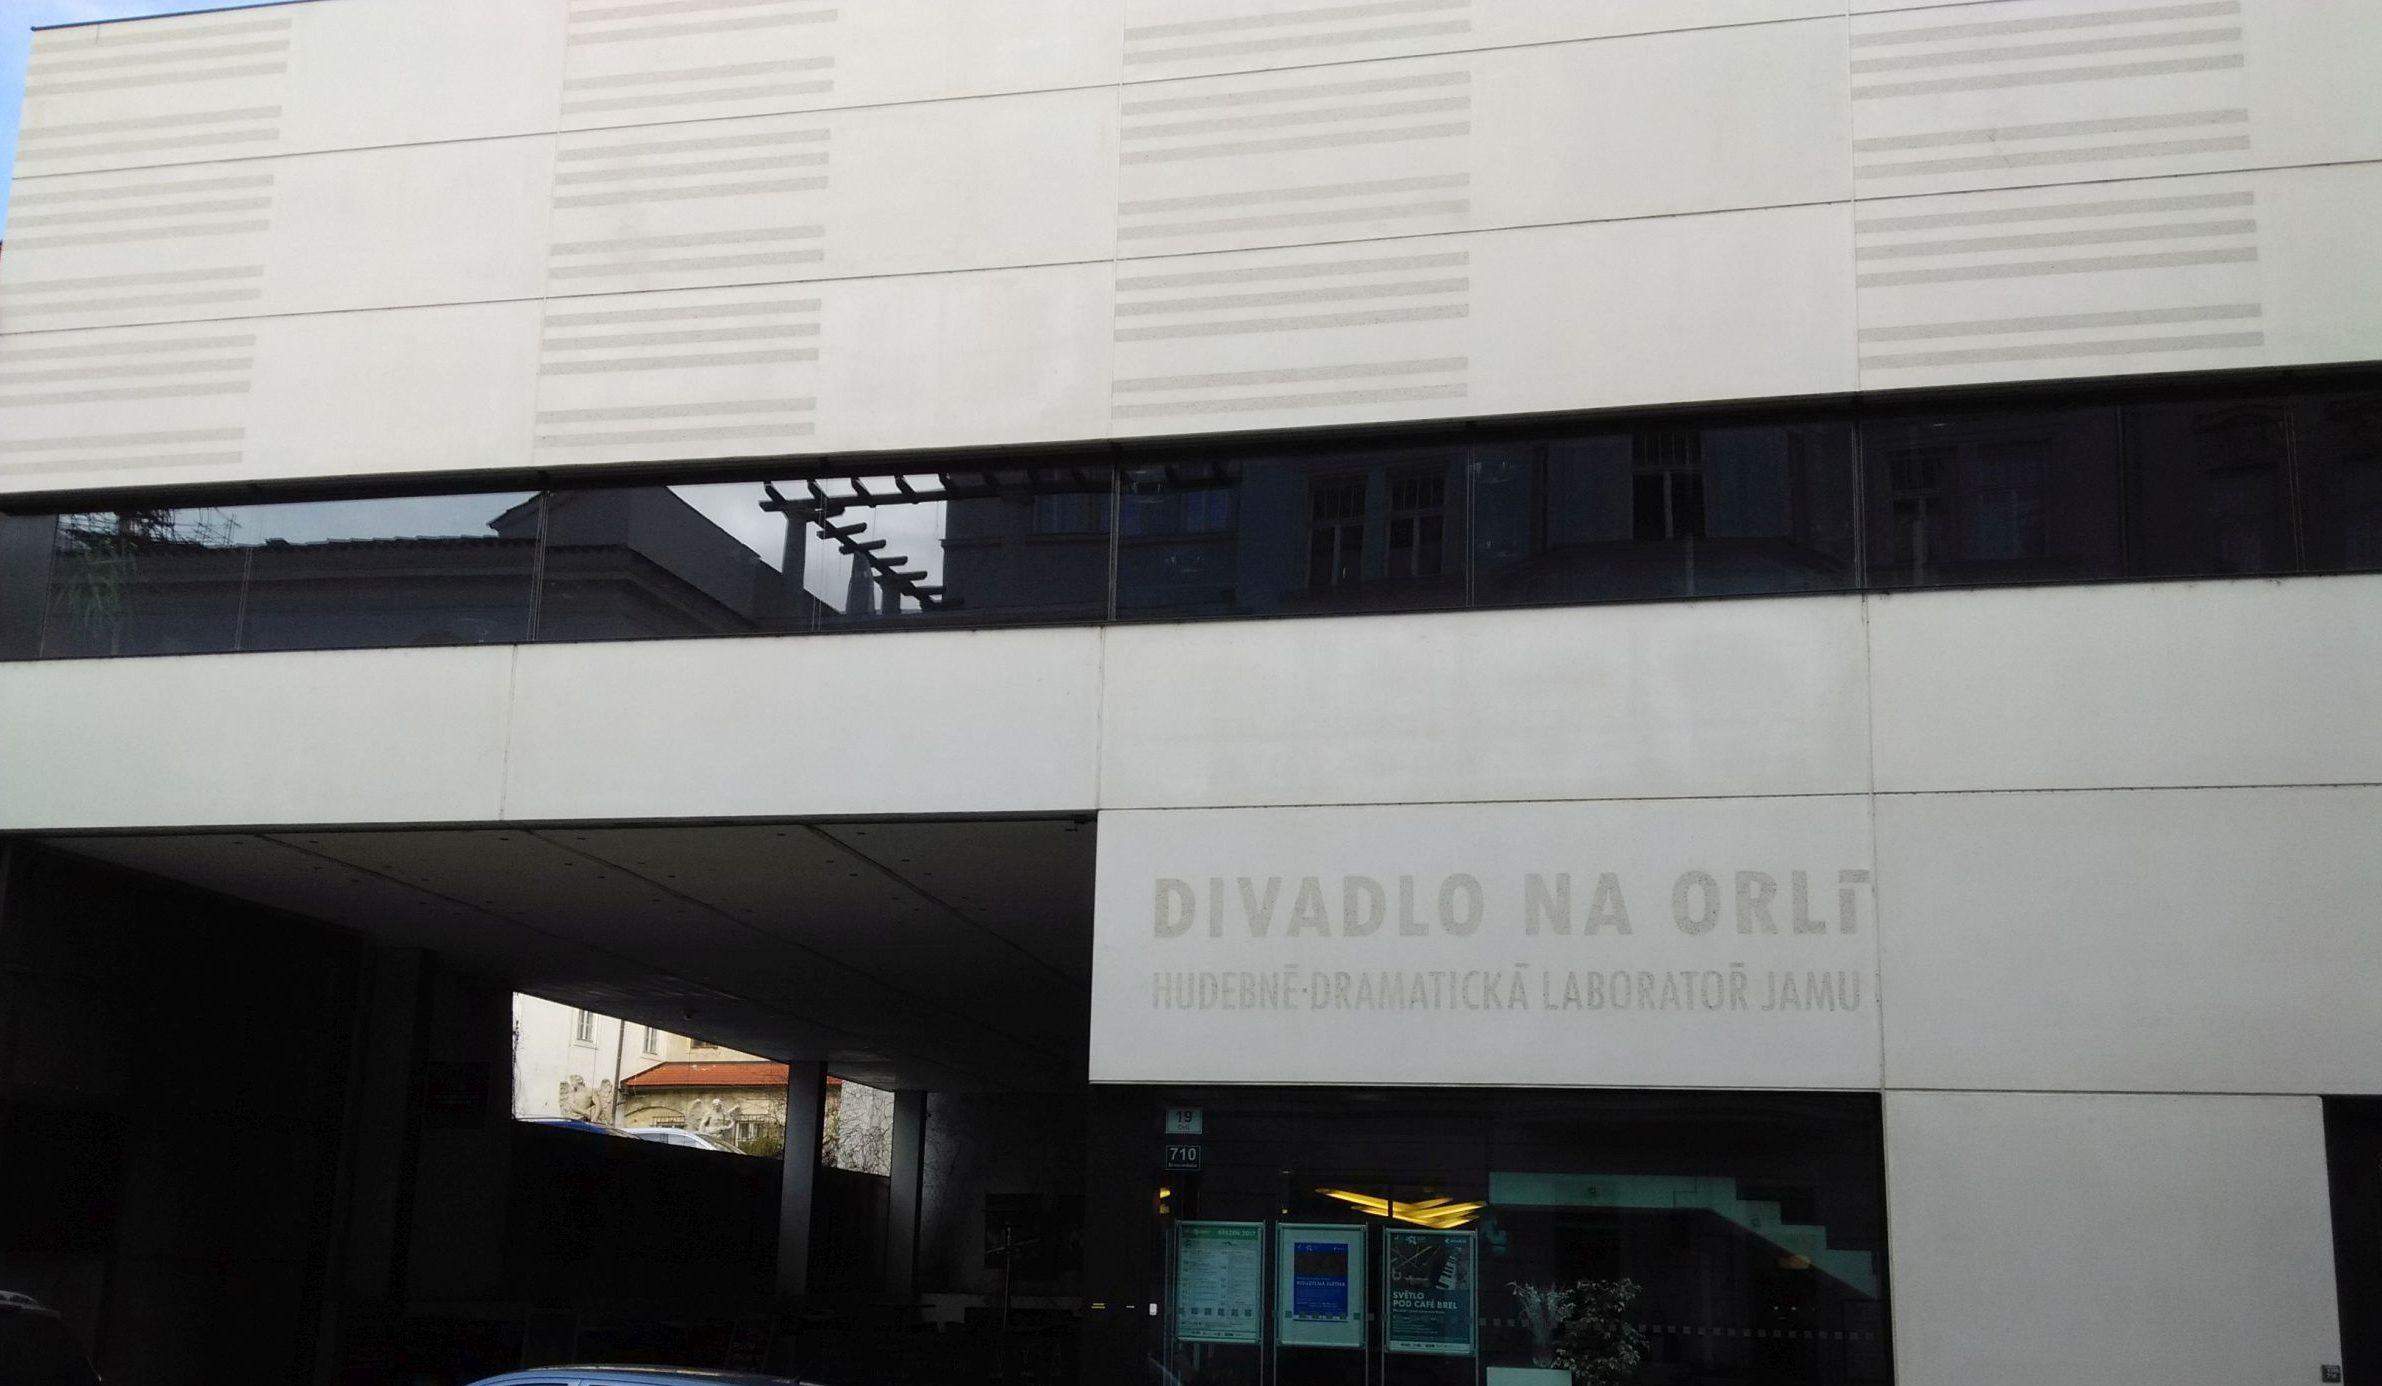 Orlí Street Theatre (Divadlo na Orlí) in Brno